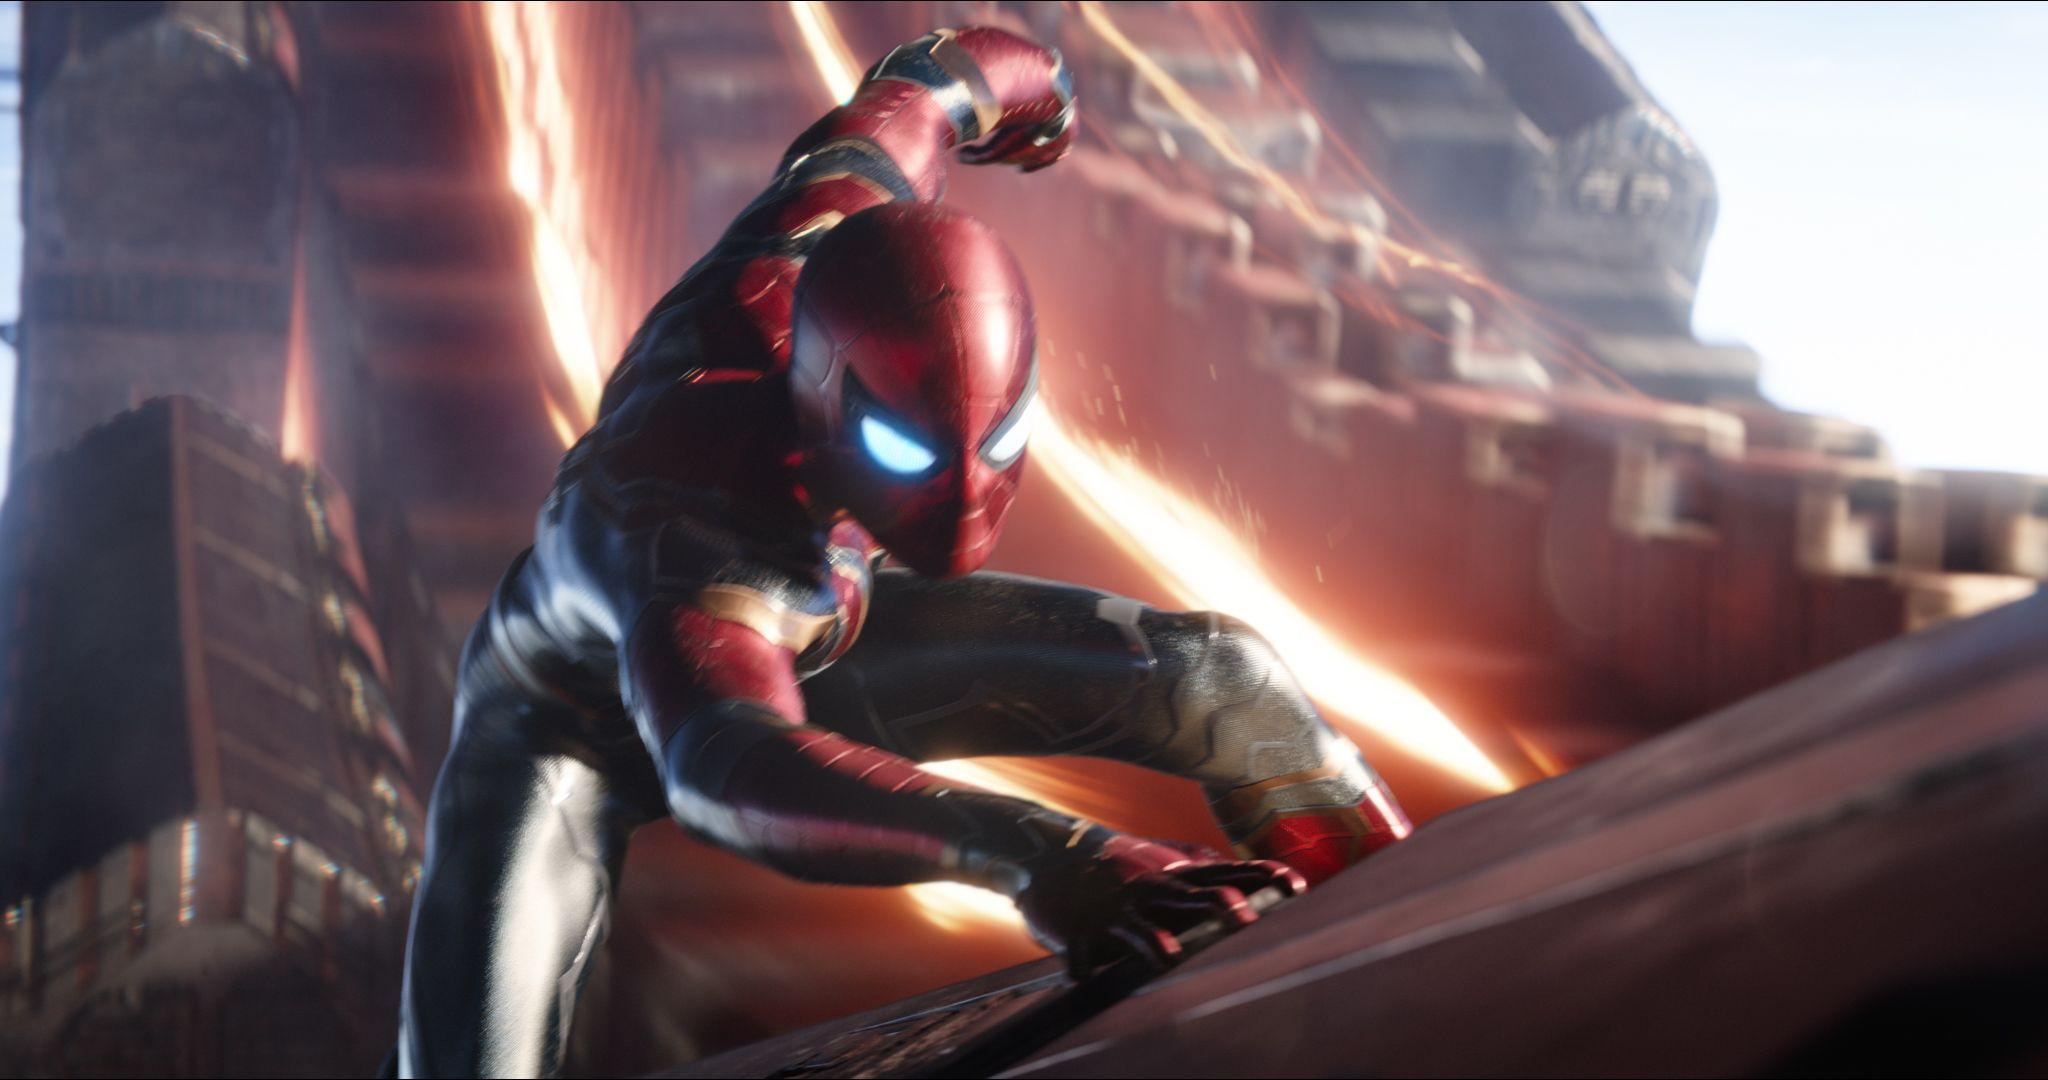 Dtt4200 V519 1049 Jpg 2 048 1 080 Pixels Infinity War Theories Avengers Infinity War Avengers